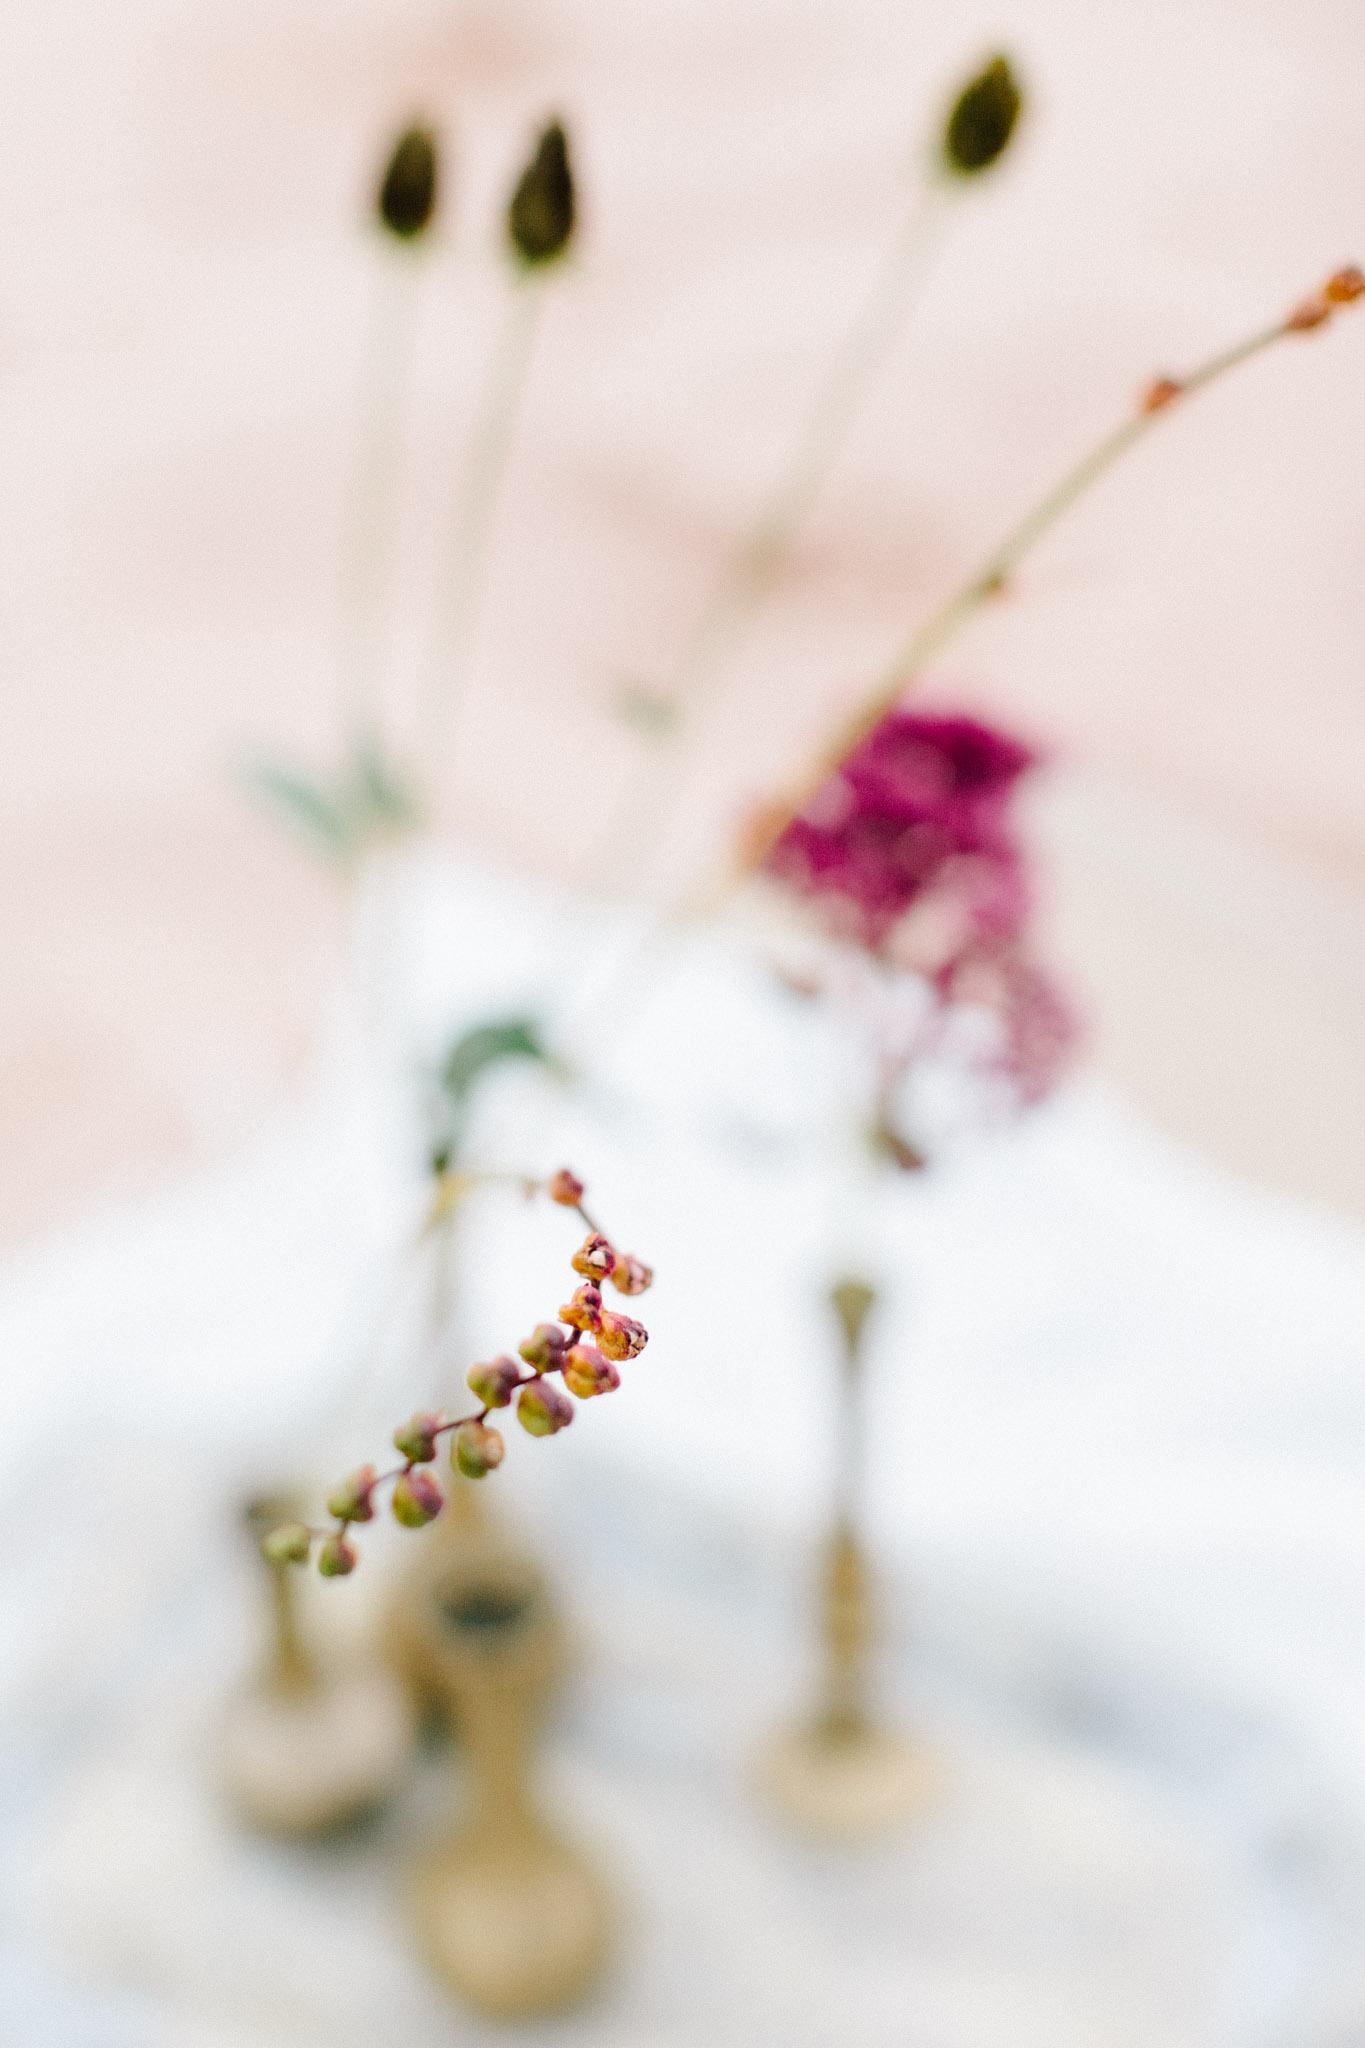 Speyer-Moroccan-Wedding-Inspiration-Pia-Anna-Christian-Wedding-Photography-S-62.jpg